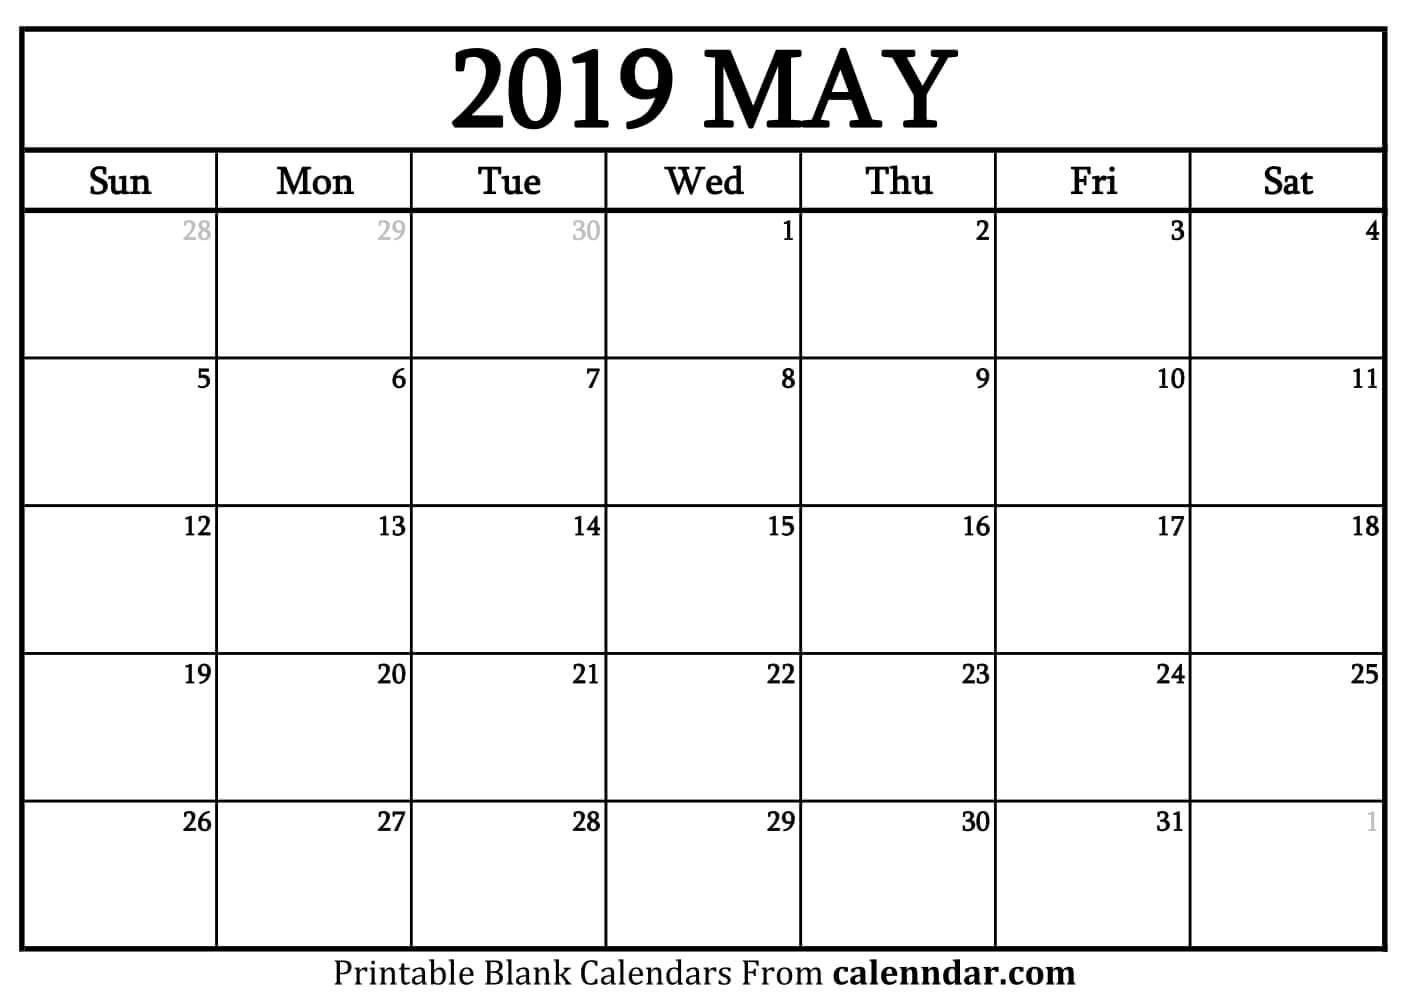 Blank May 2019 Calendar Templates – Calenndar Calendar 2019 May